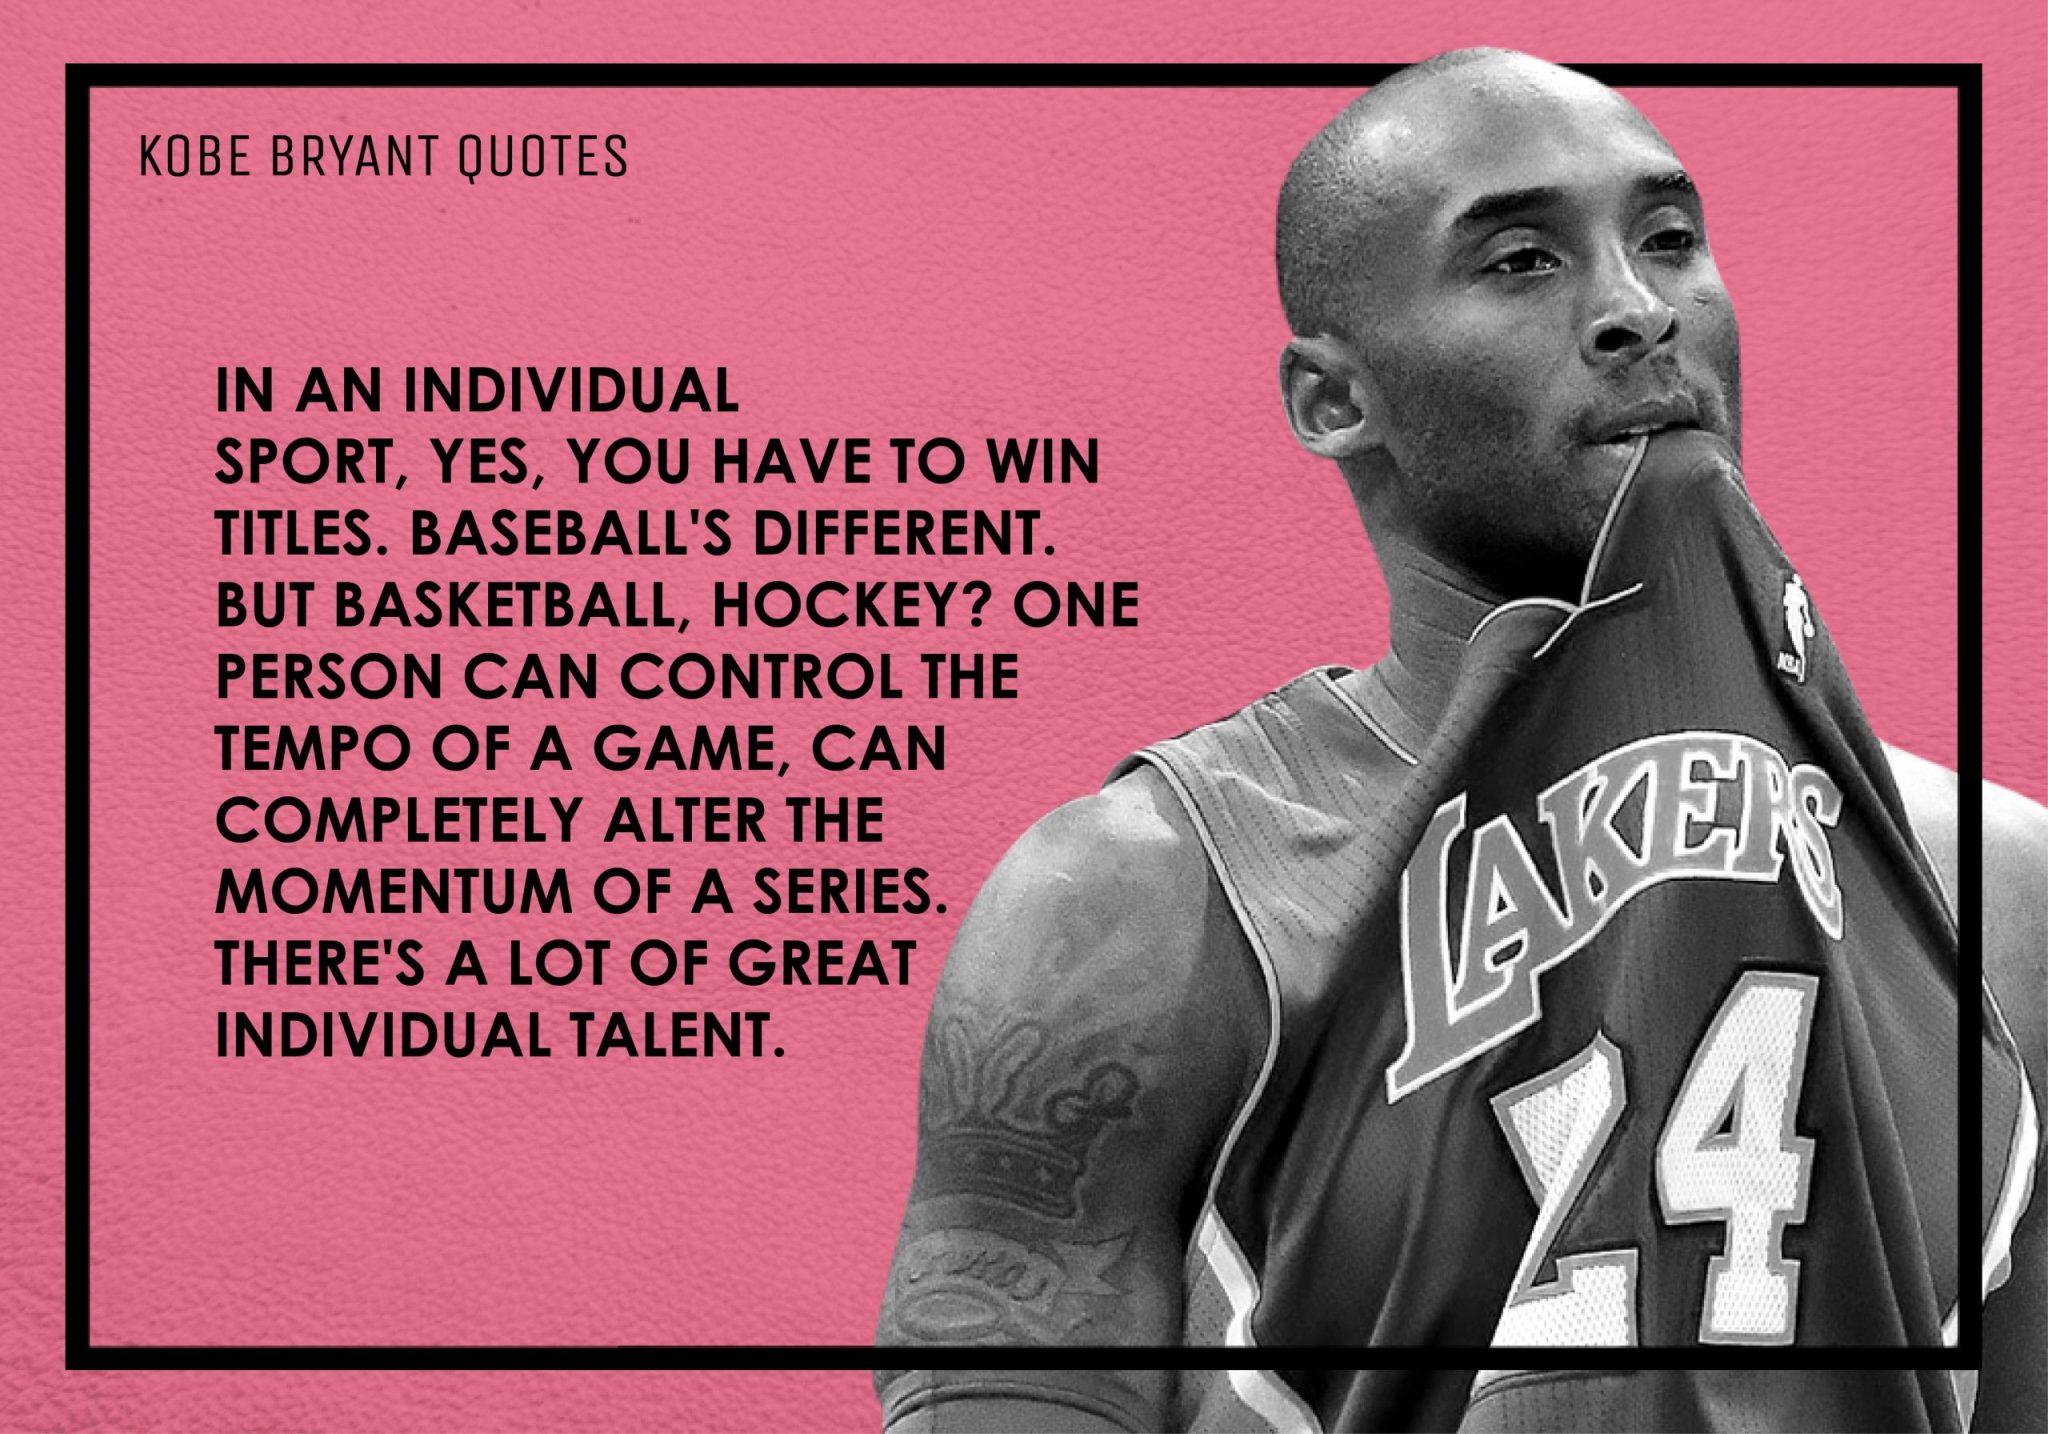 Kobe Bryant Quotes (5)